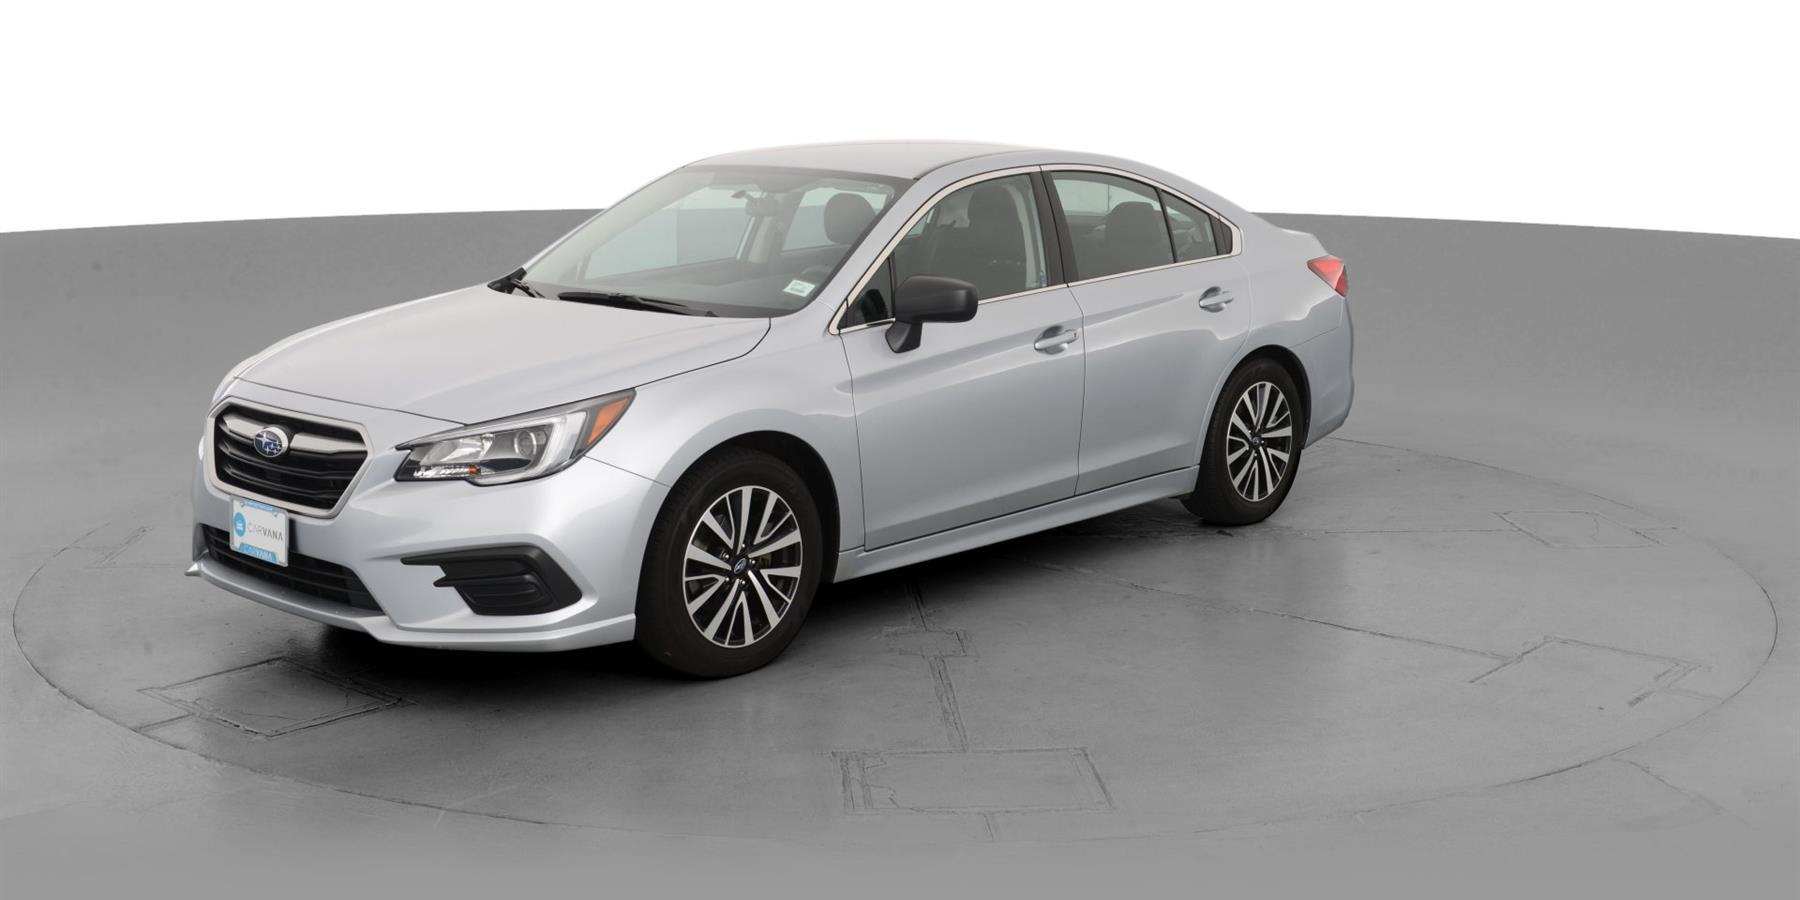 2018 Subaru Legacy 2 5i Sedan 4D for Sale | Carvana®